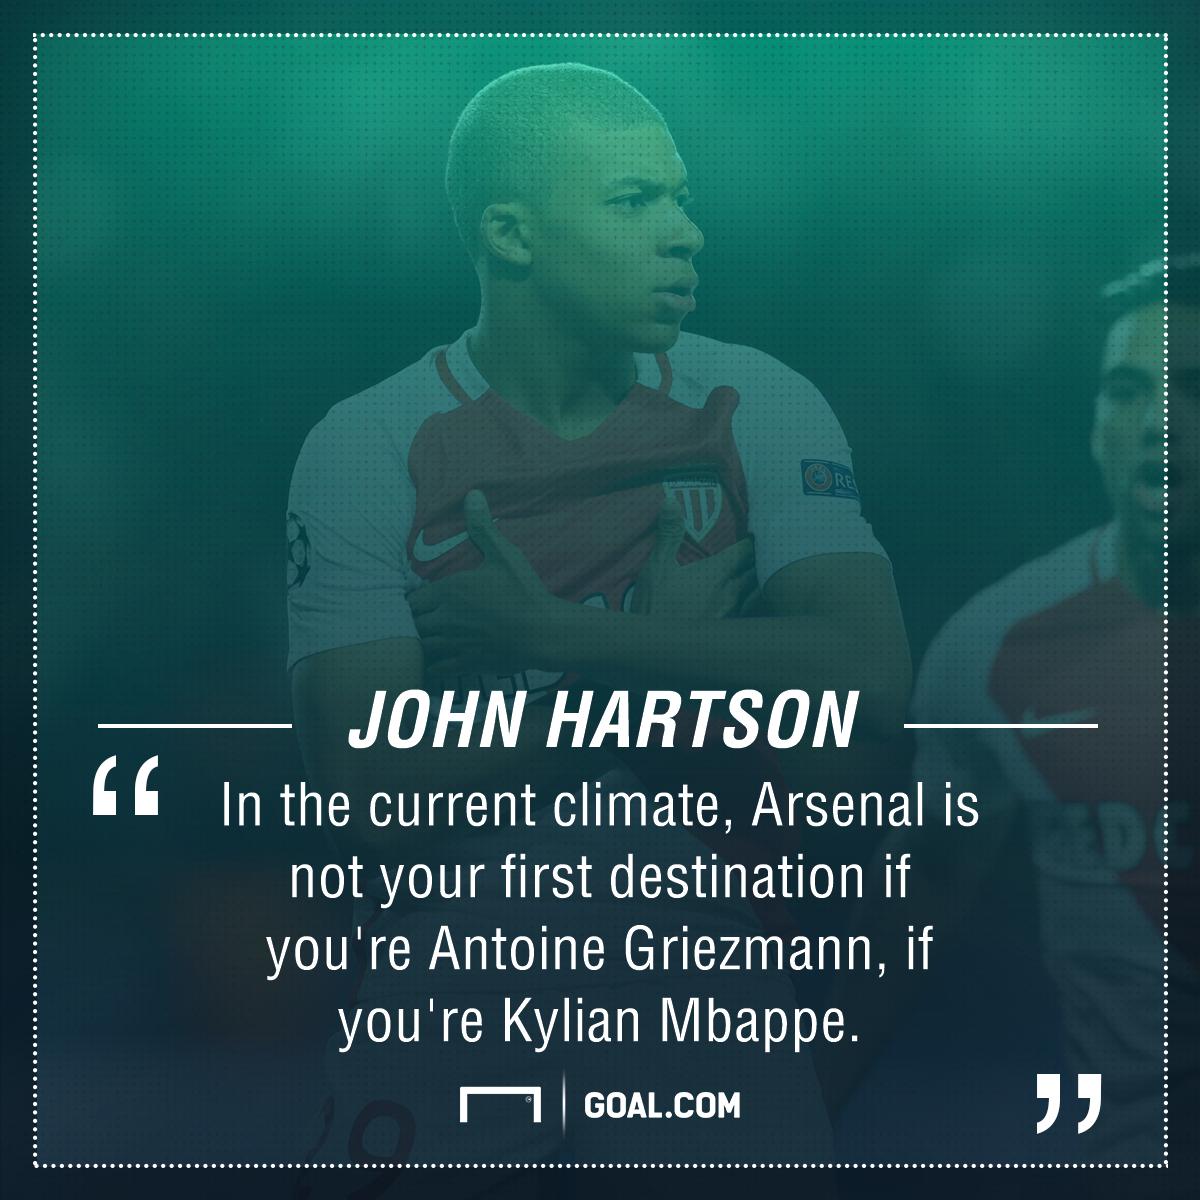 John Hartson Arsenal Griezmann Mbappe